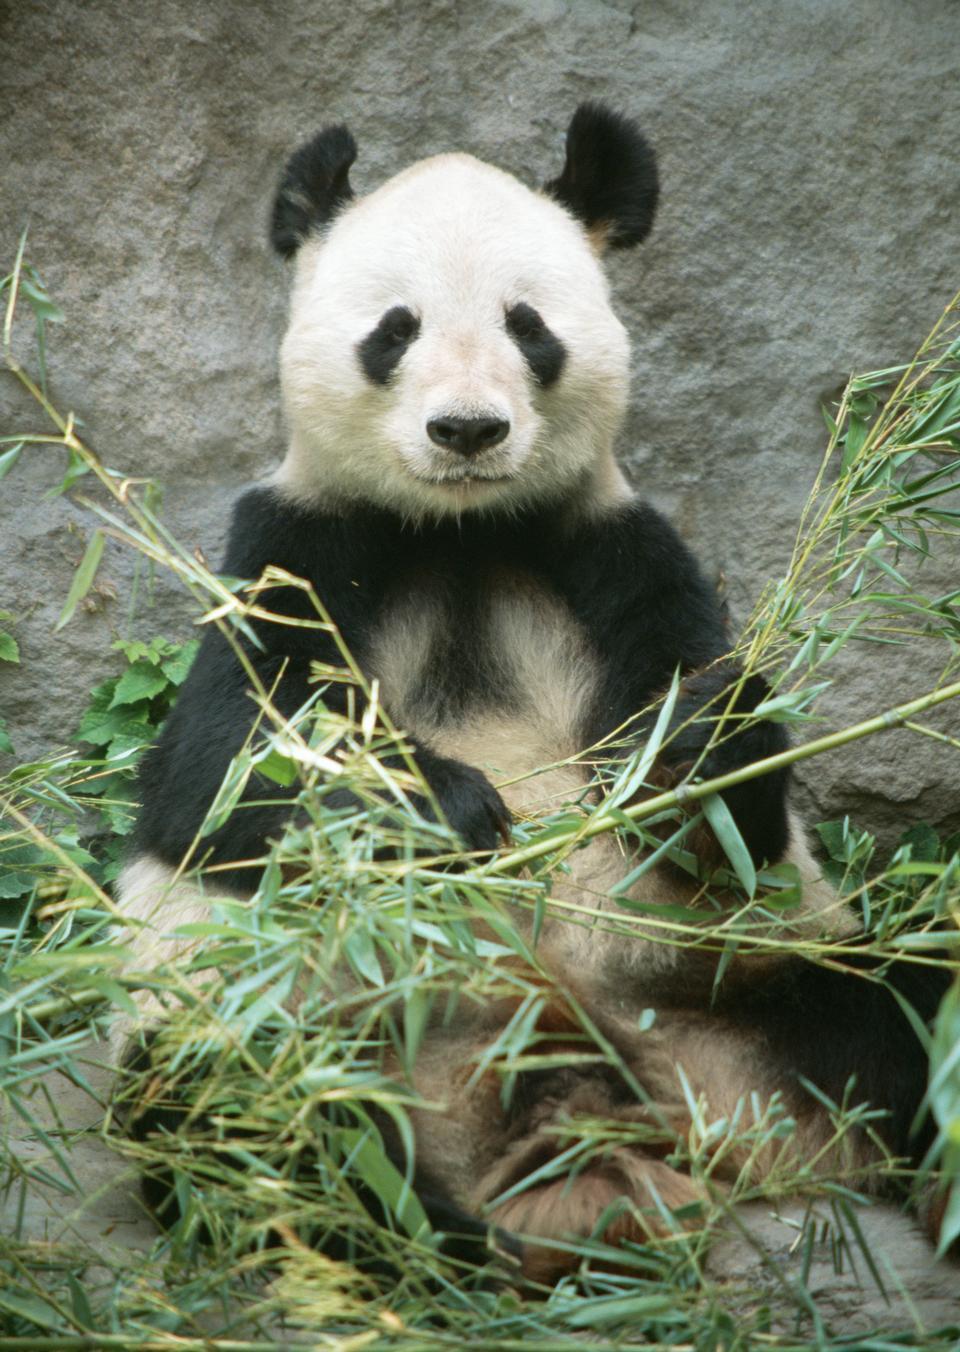 Giant panda bear in Bamboo